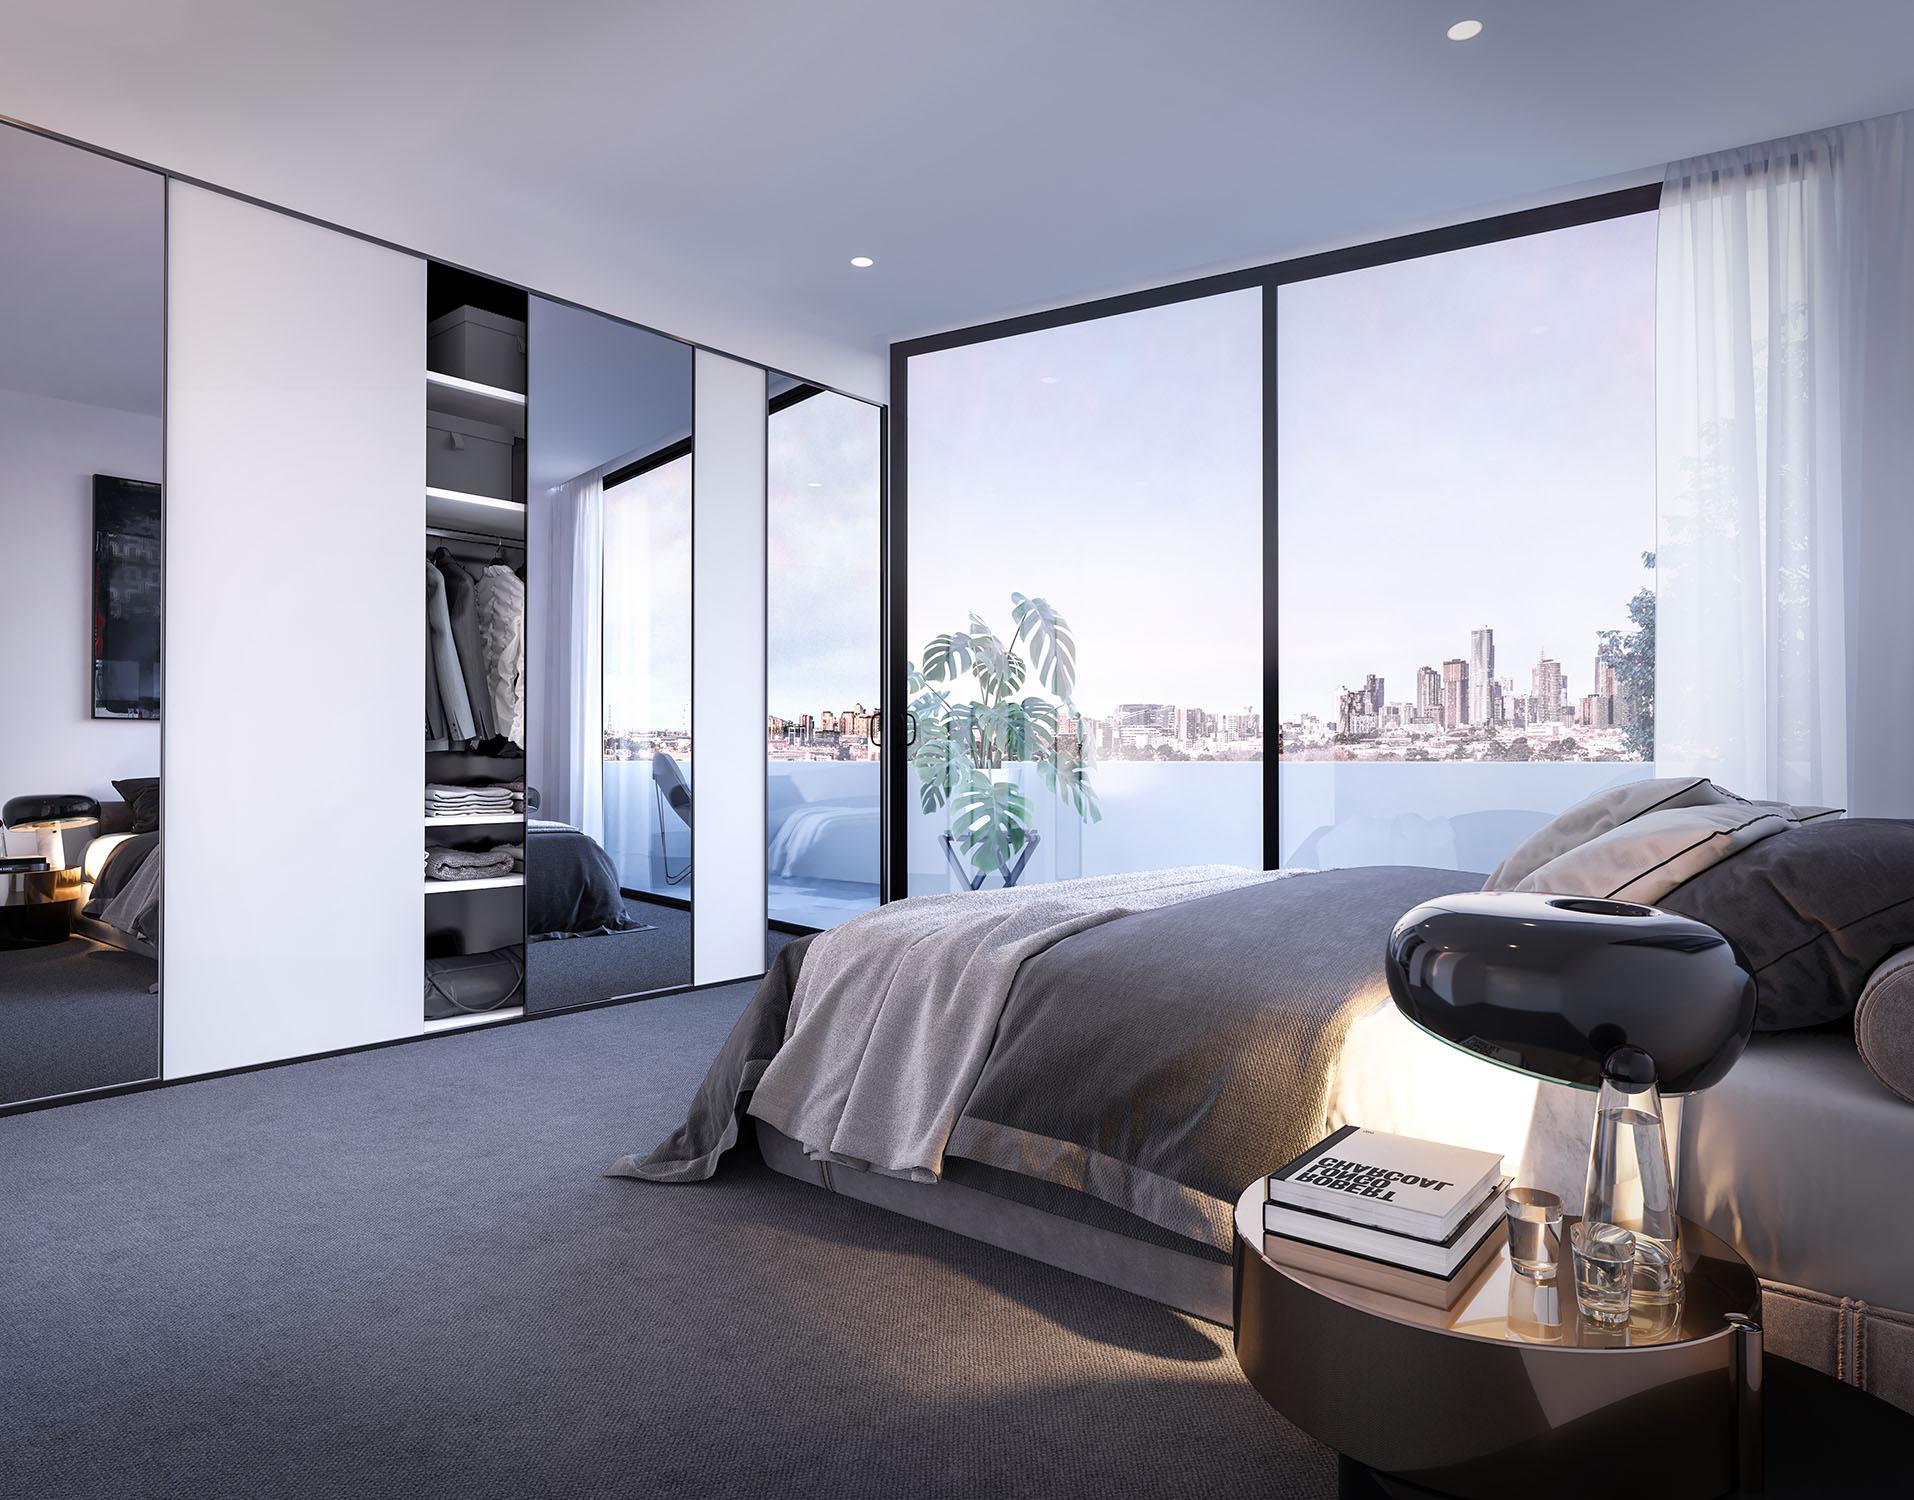 royal ascot bedroom